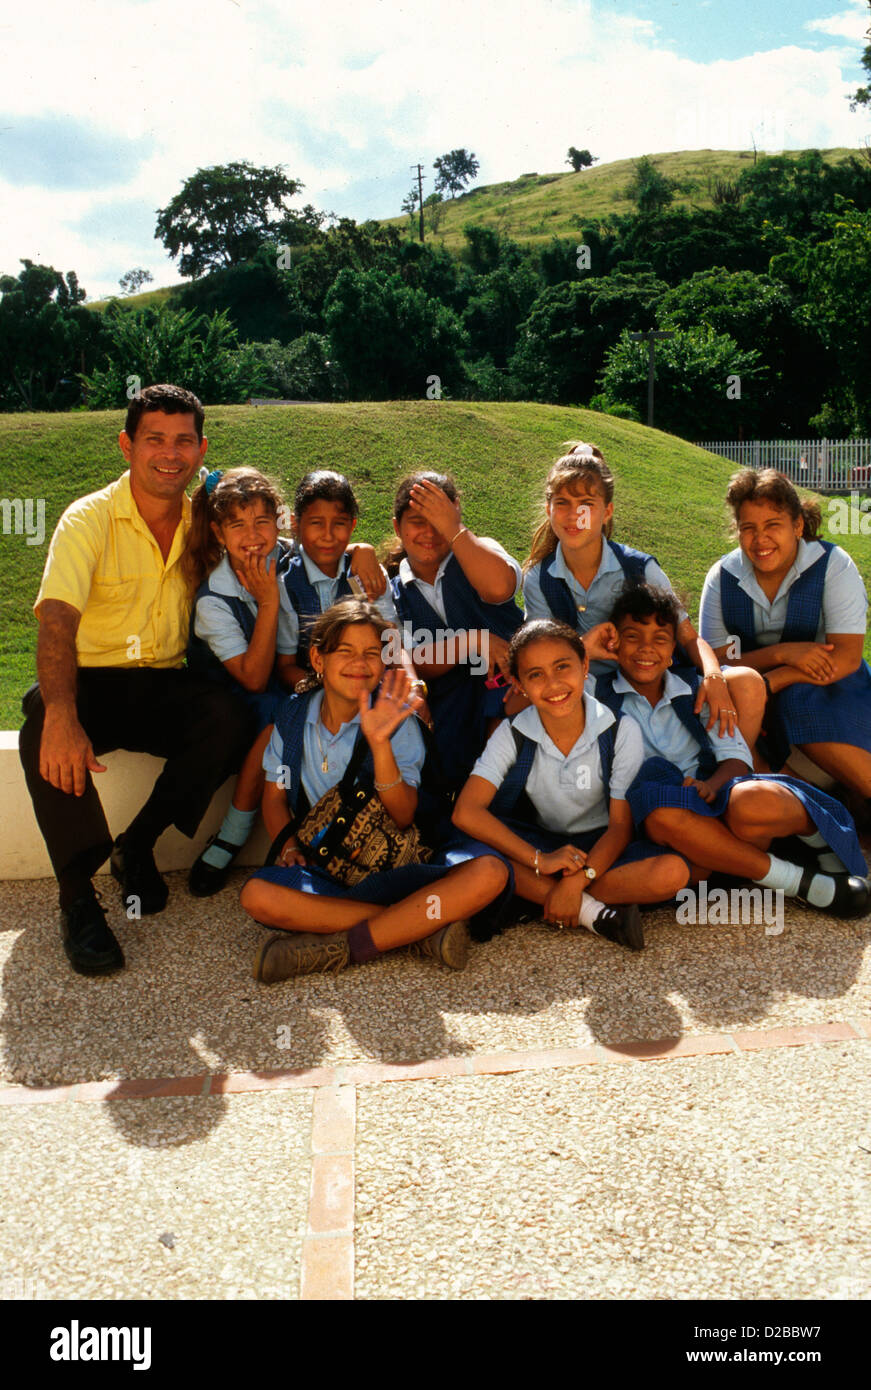 Puerto Rico, Ponce, Schoolchildren In Uniforms - Stock Image